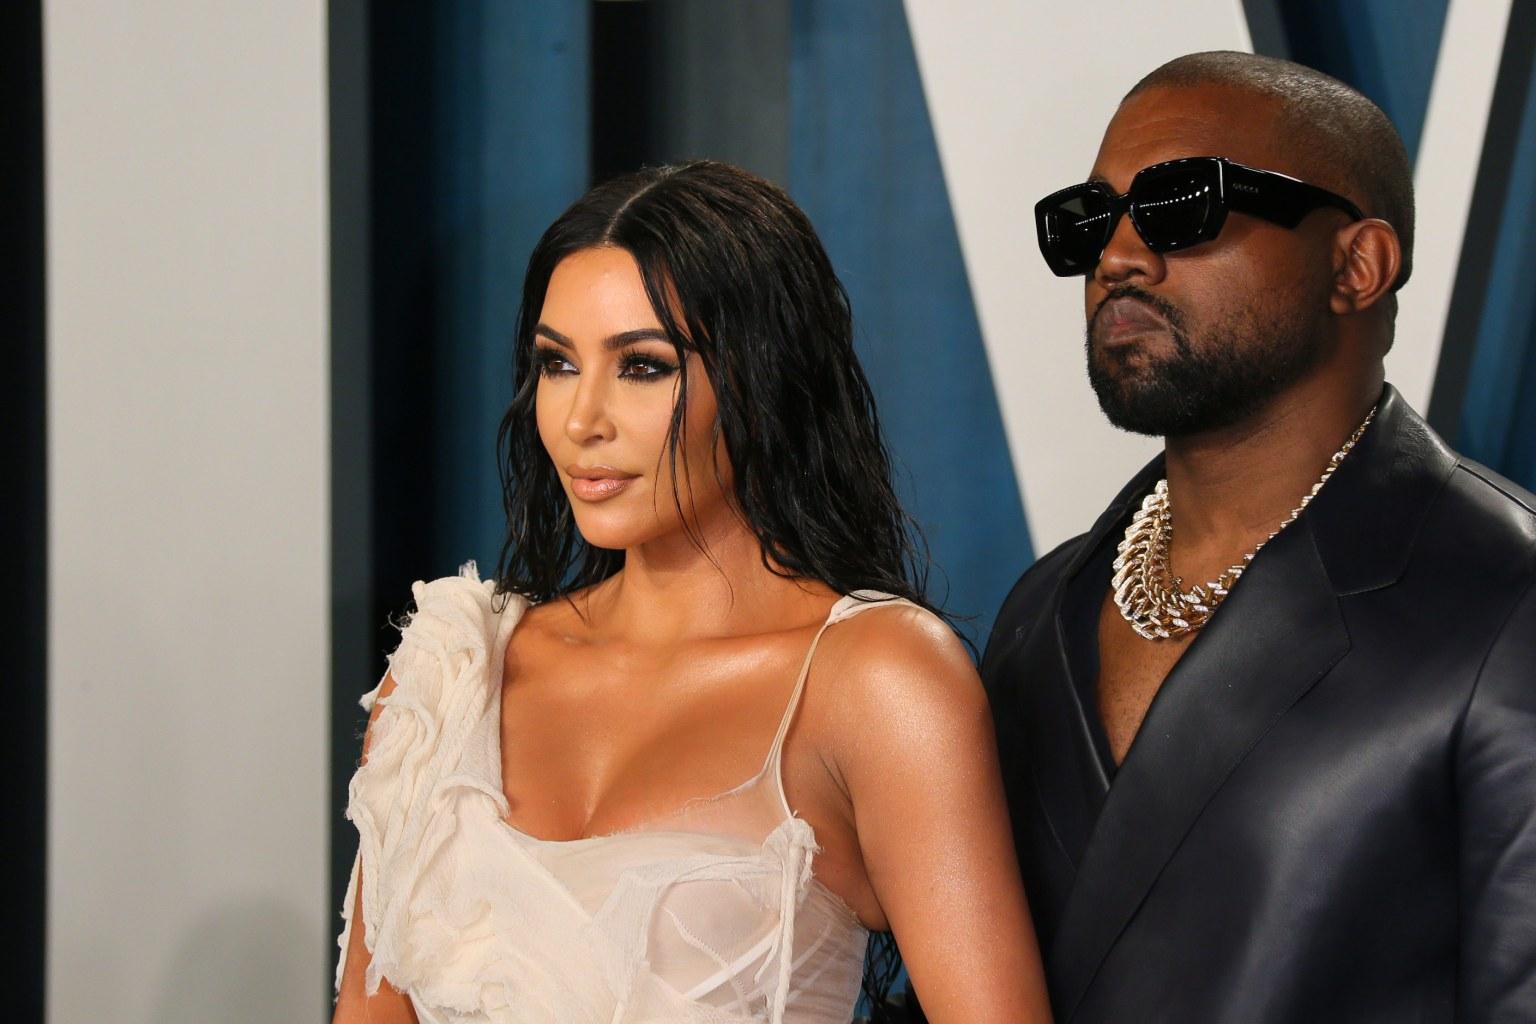 Kanye West asks for joint custody in divorce filing